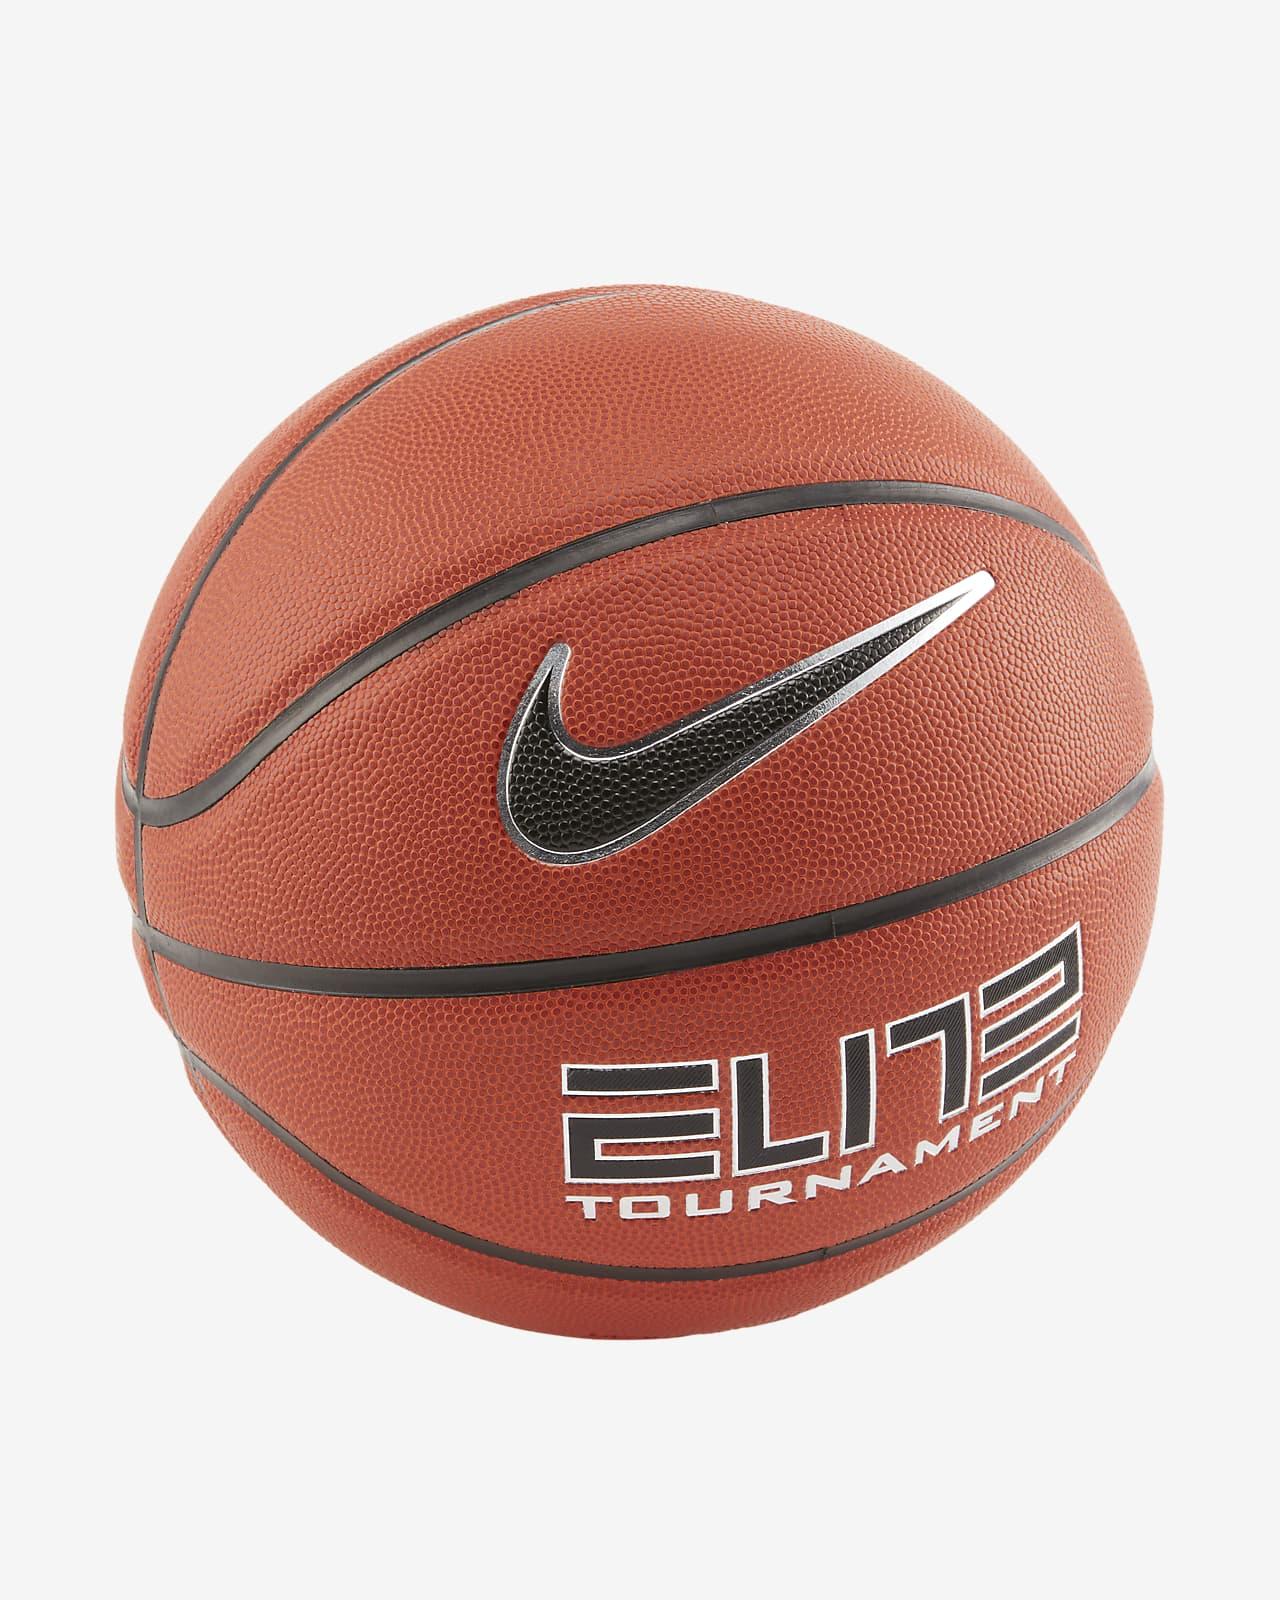 Nike Elite Tournament Basketball (Size 6 and 7)